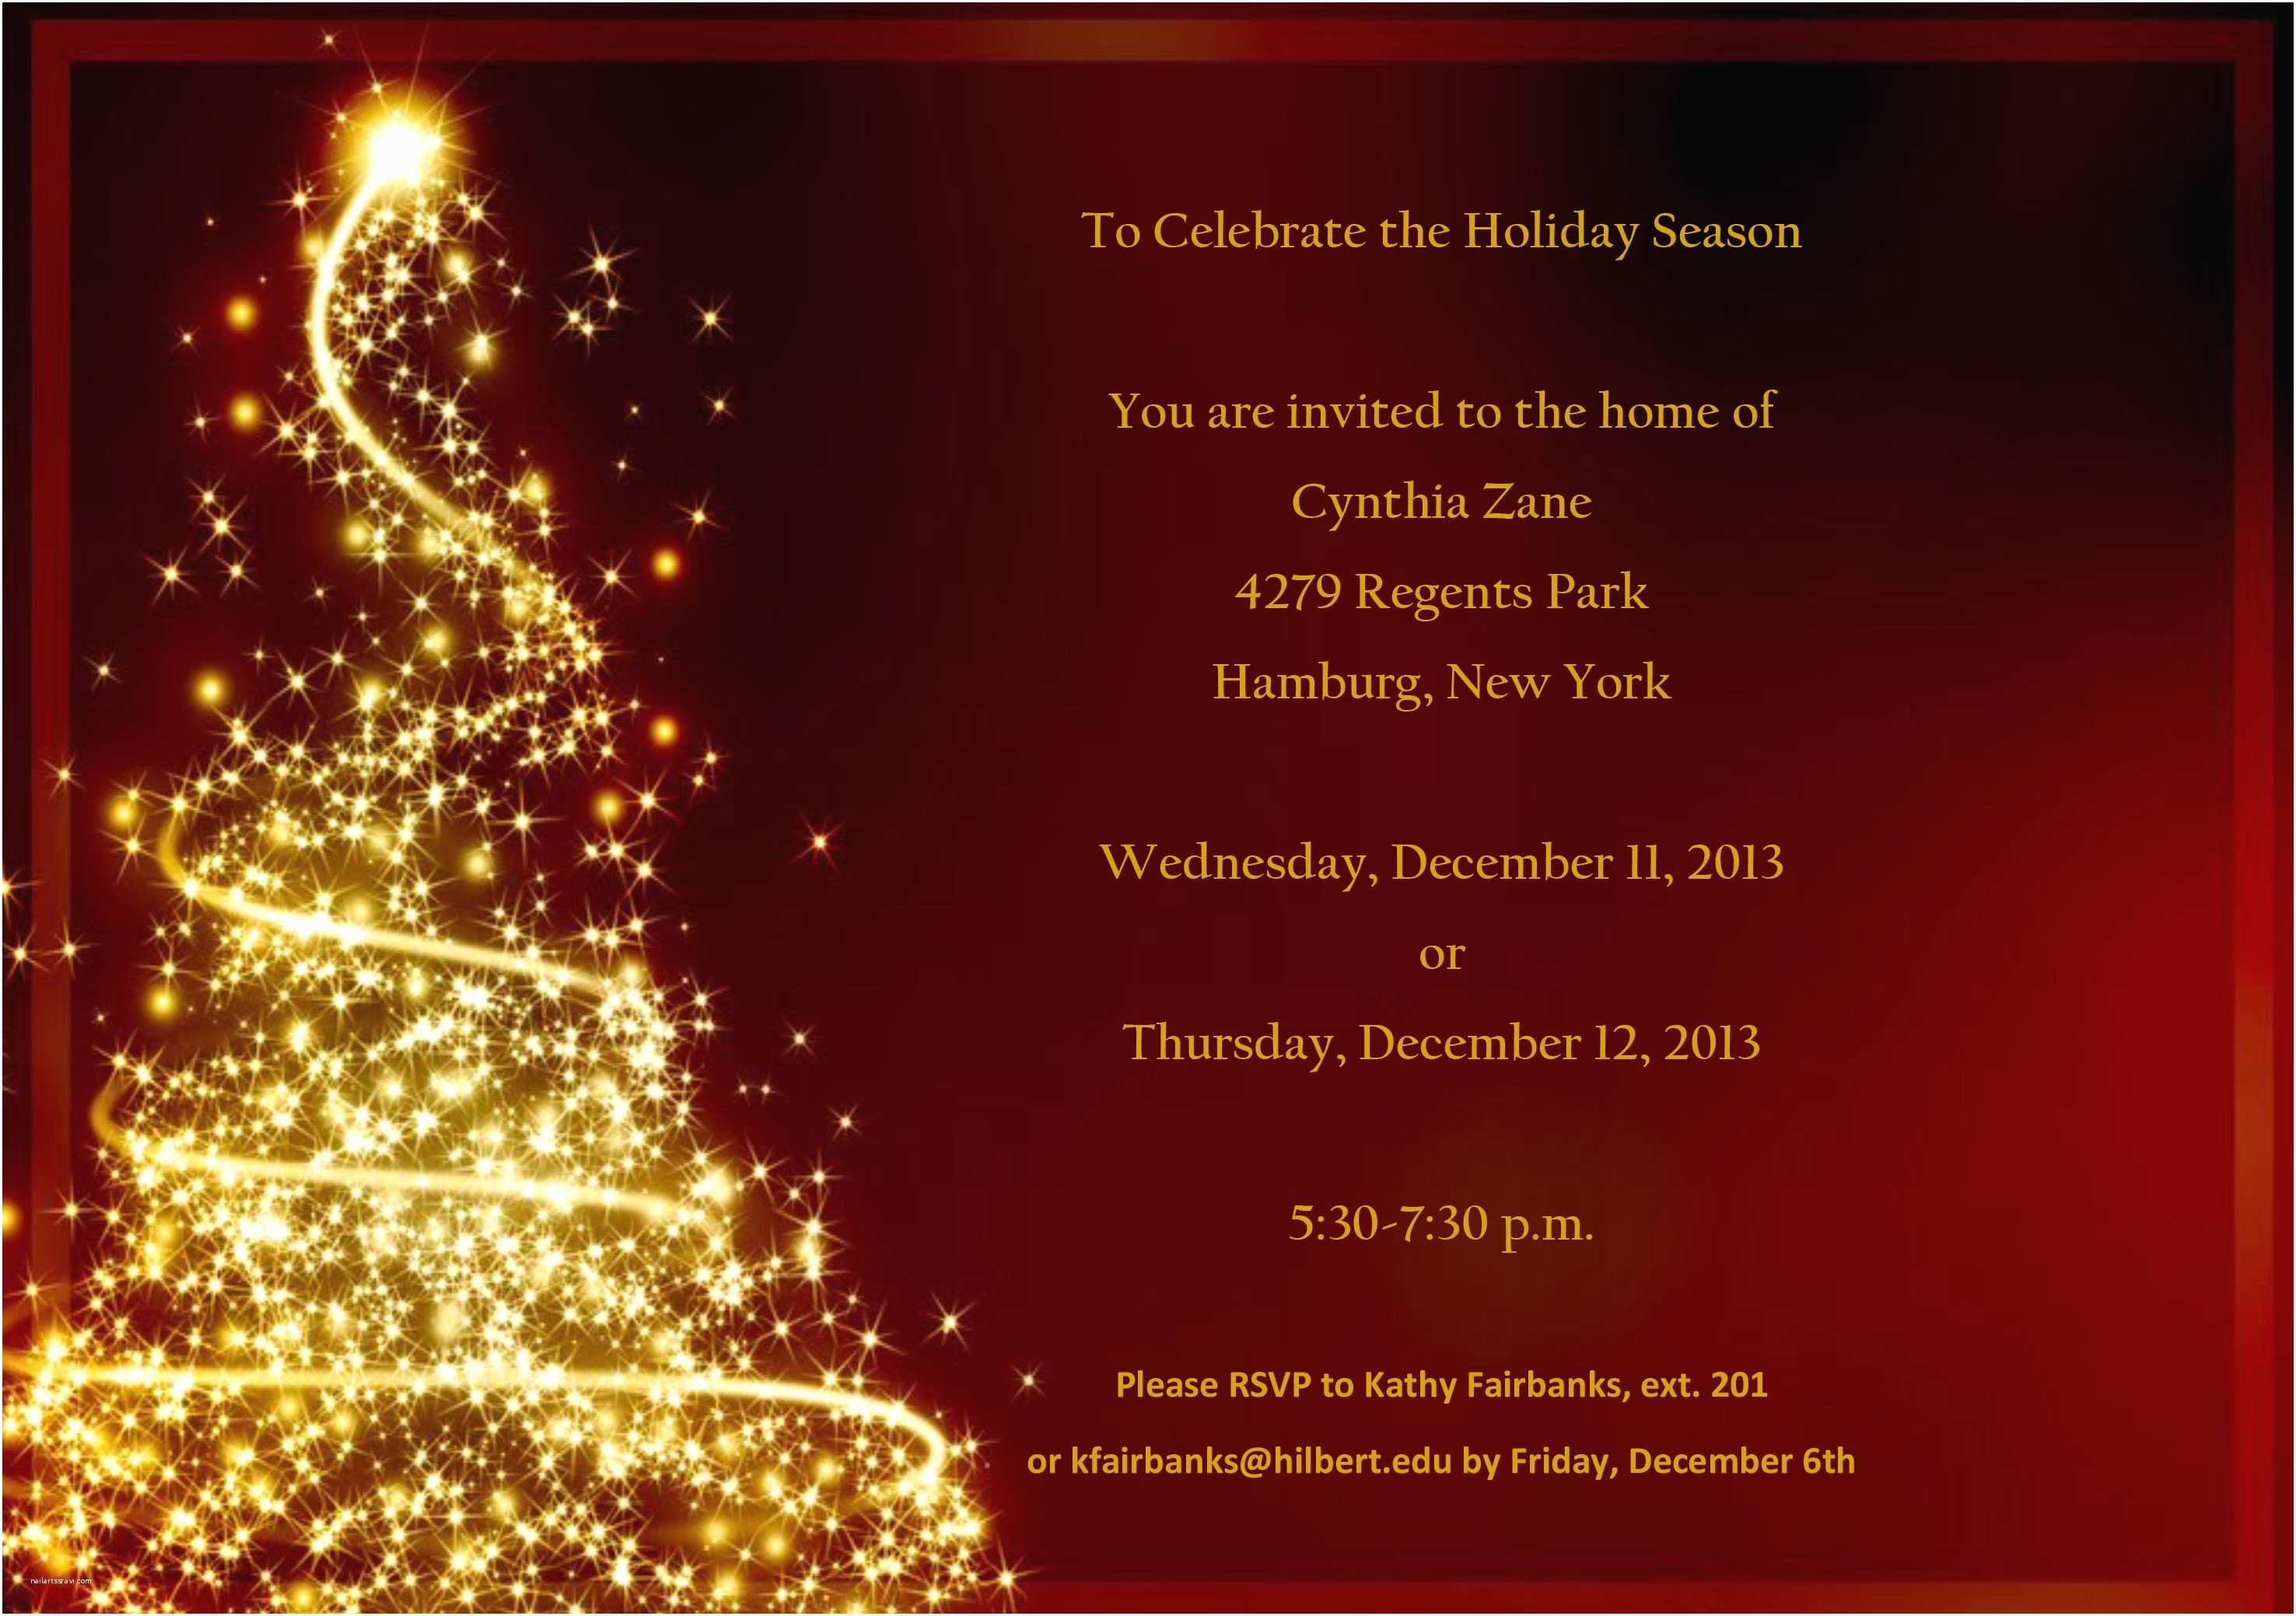 Free Christmas Party Invitation Templates Christmas Party Invitation Templates Free Download